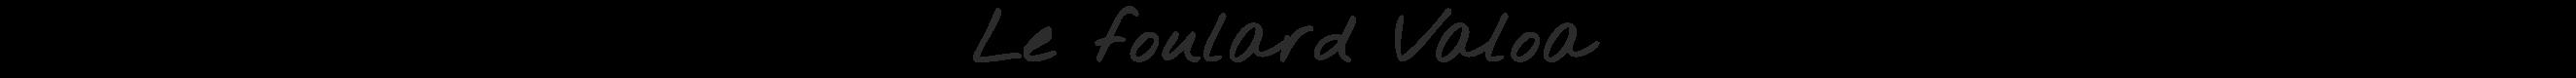 http://lookbook.allee-du-foulard.fr/wp-content/uploads/2018/05/0662-ADF-Accessoires-de-mode-LB-Coll-Titre-Valoa-2650x80.png